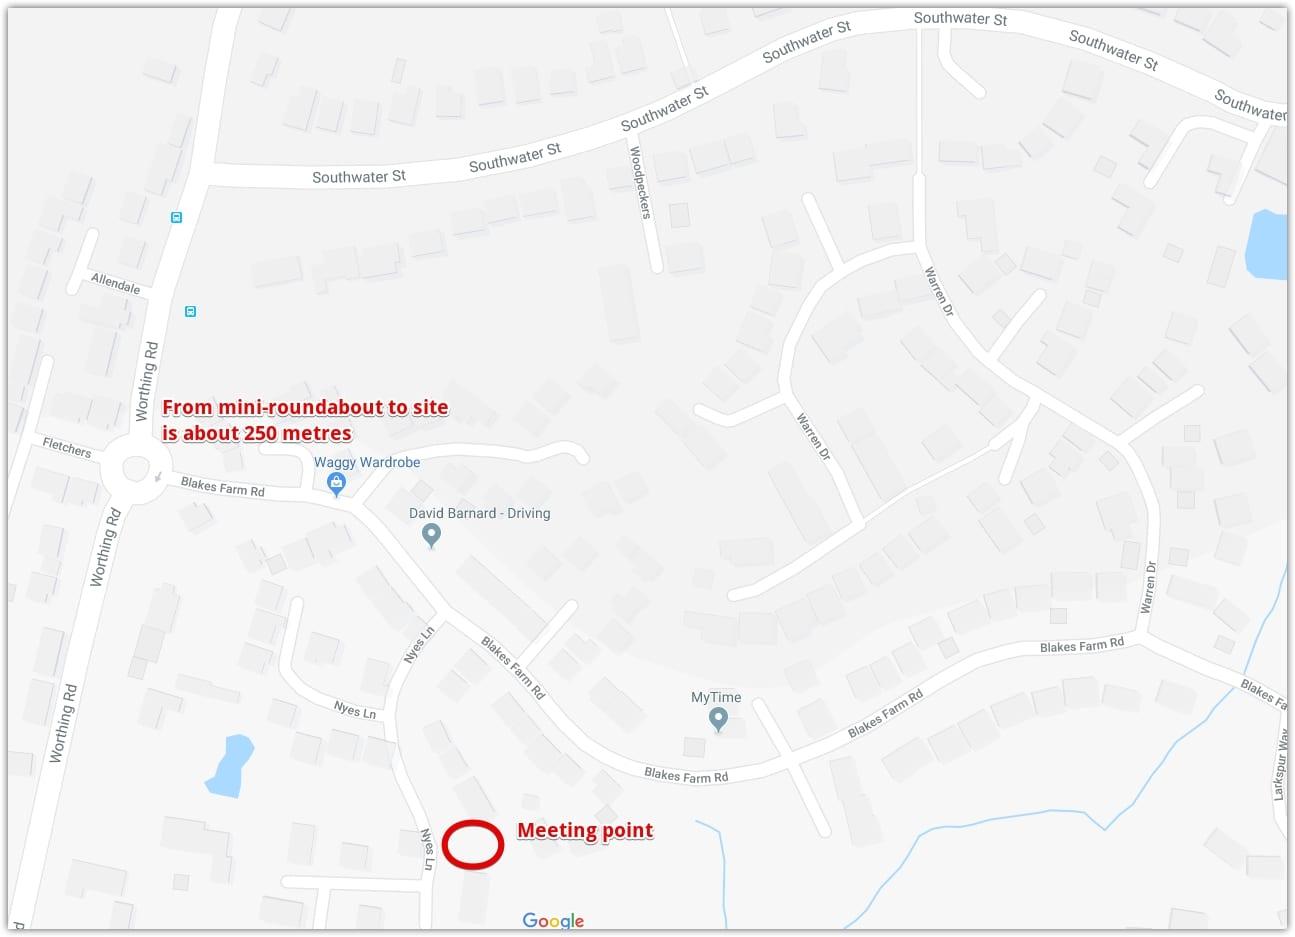 Nyes Lane location